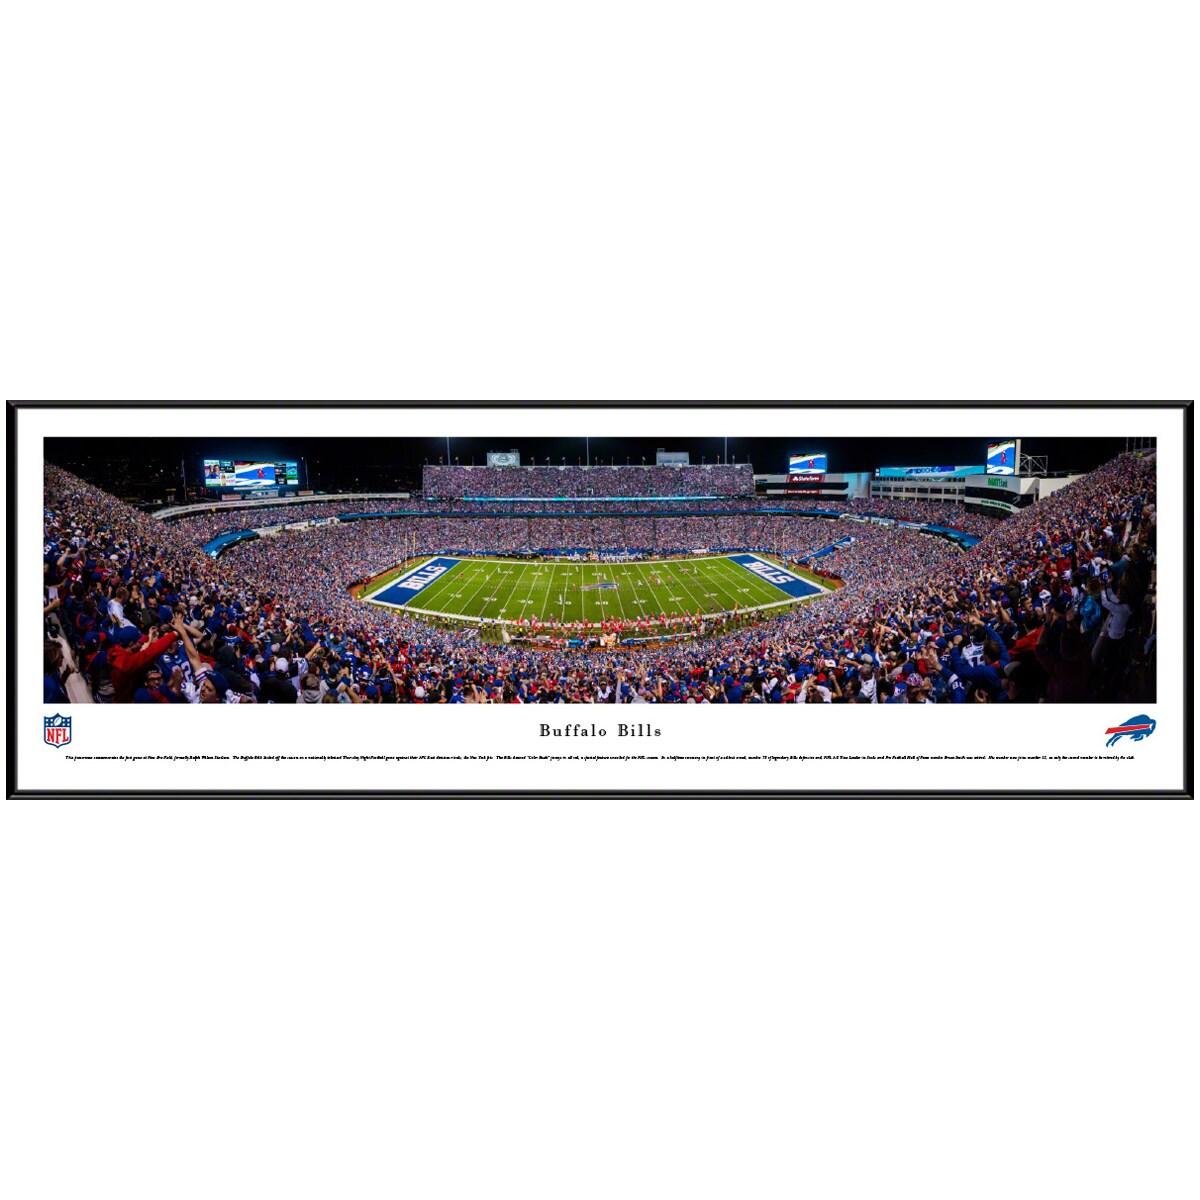 "Buffalo Bills 40.25"" x 13.75"" Standard Frame Panoramic Photo"